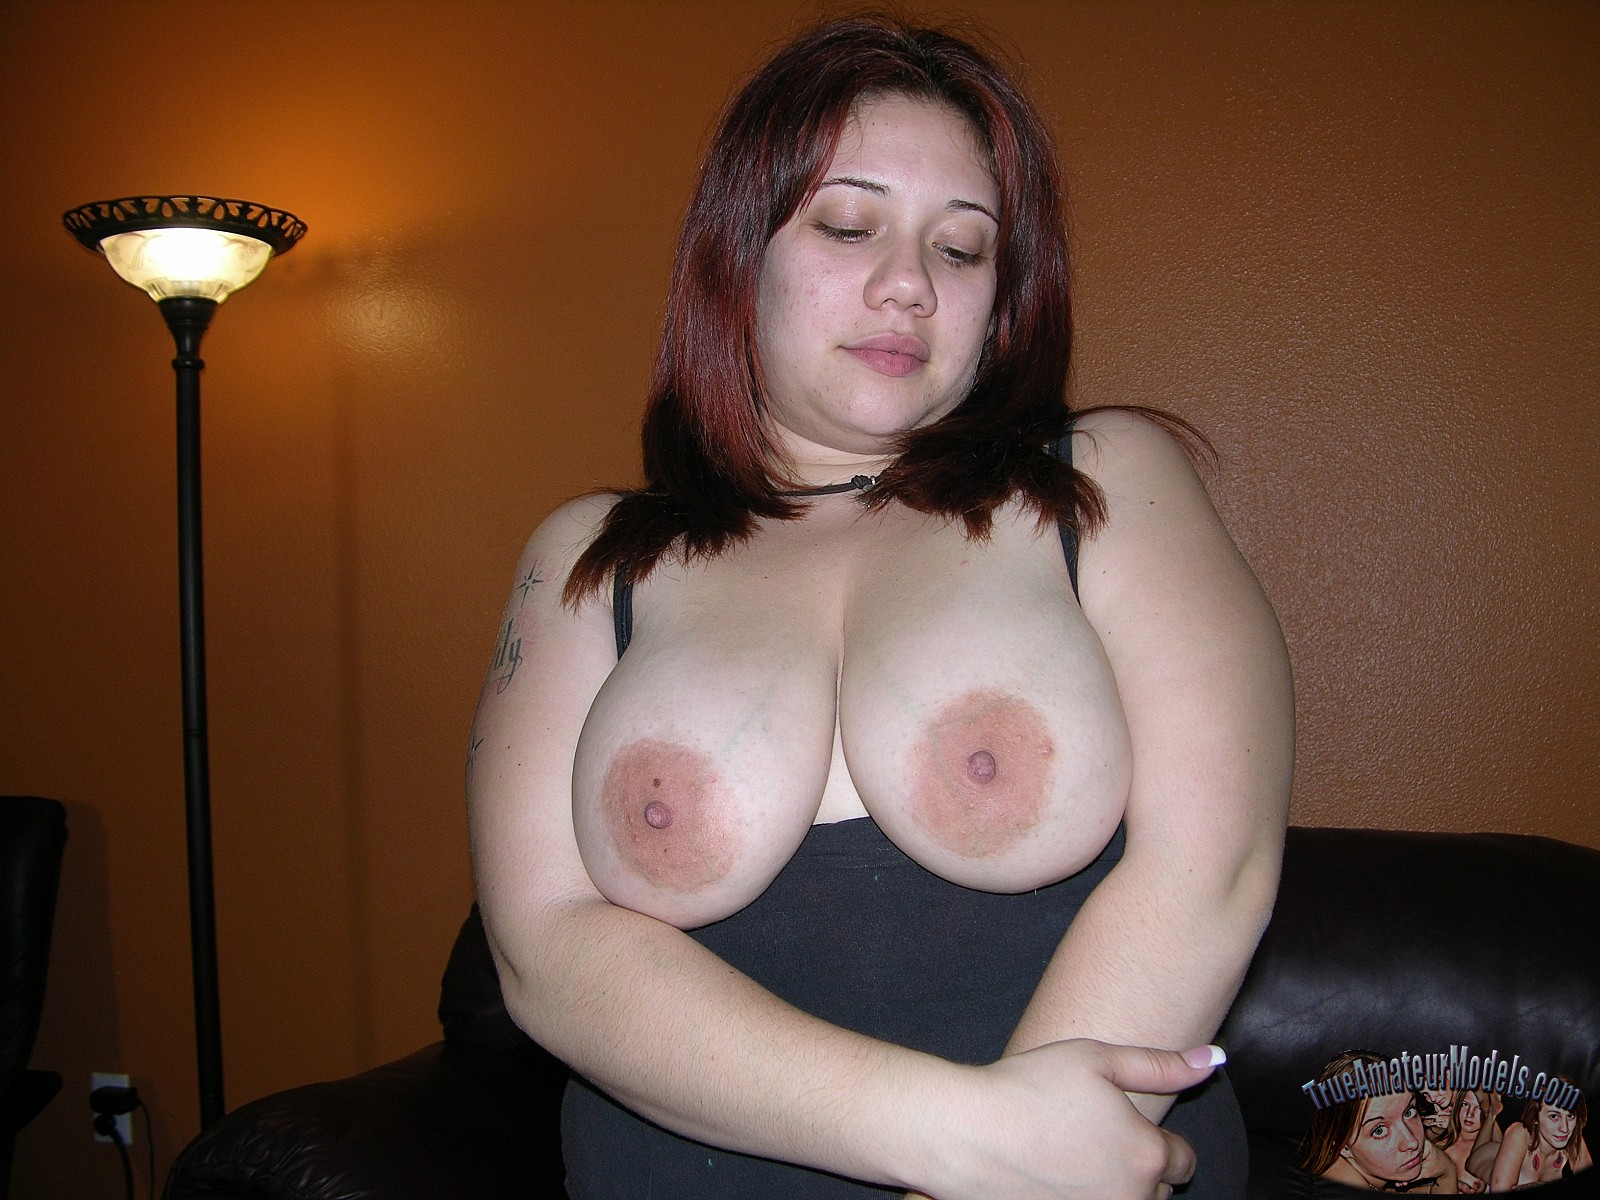 Chubby amateur girl next door spreading